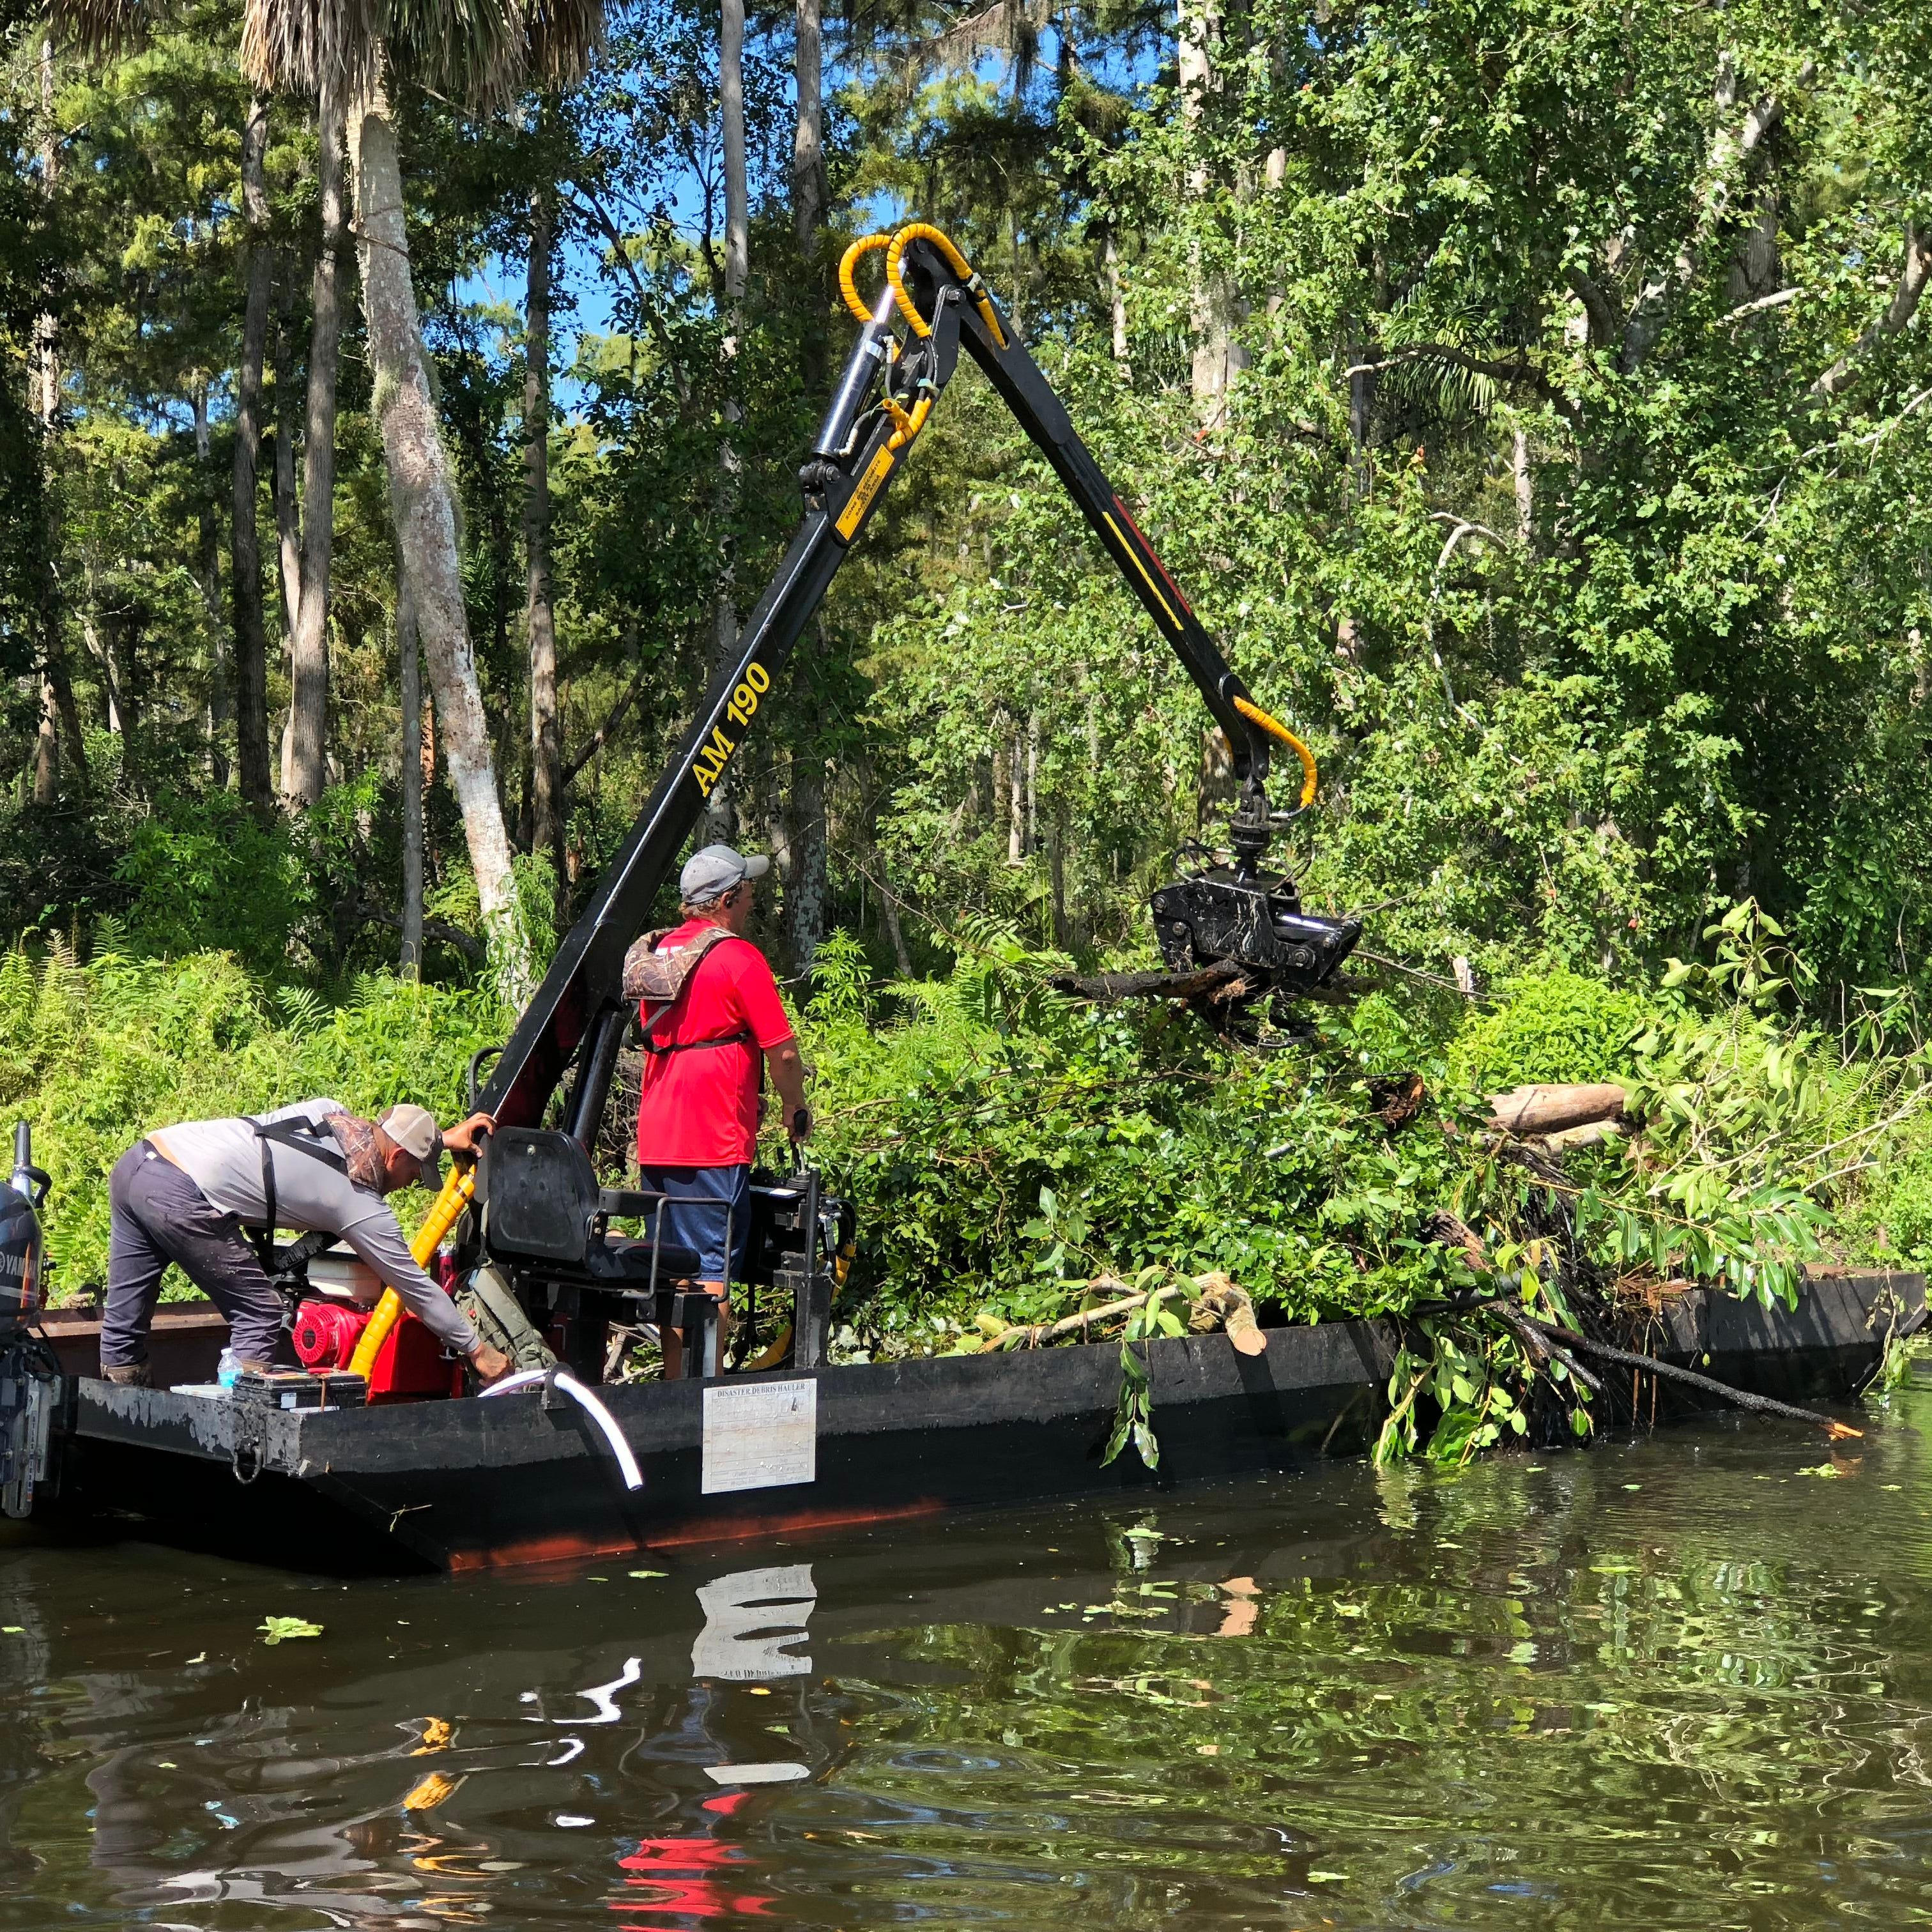 Collier County still working to clear Hurricane Irma debris from waterways